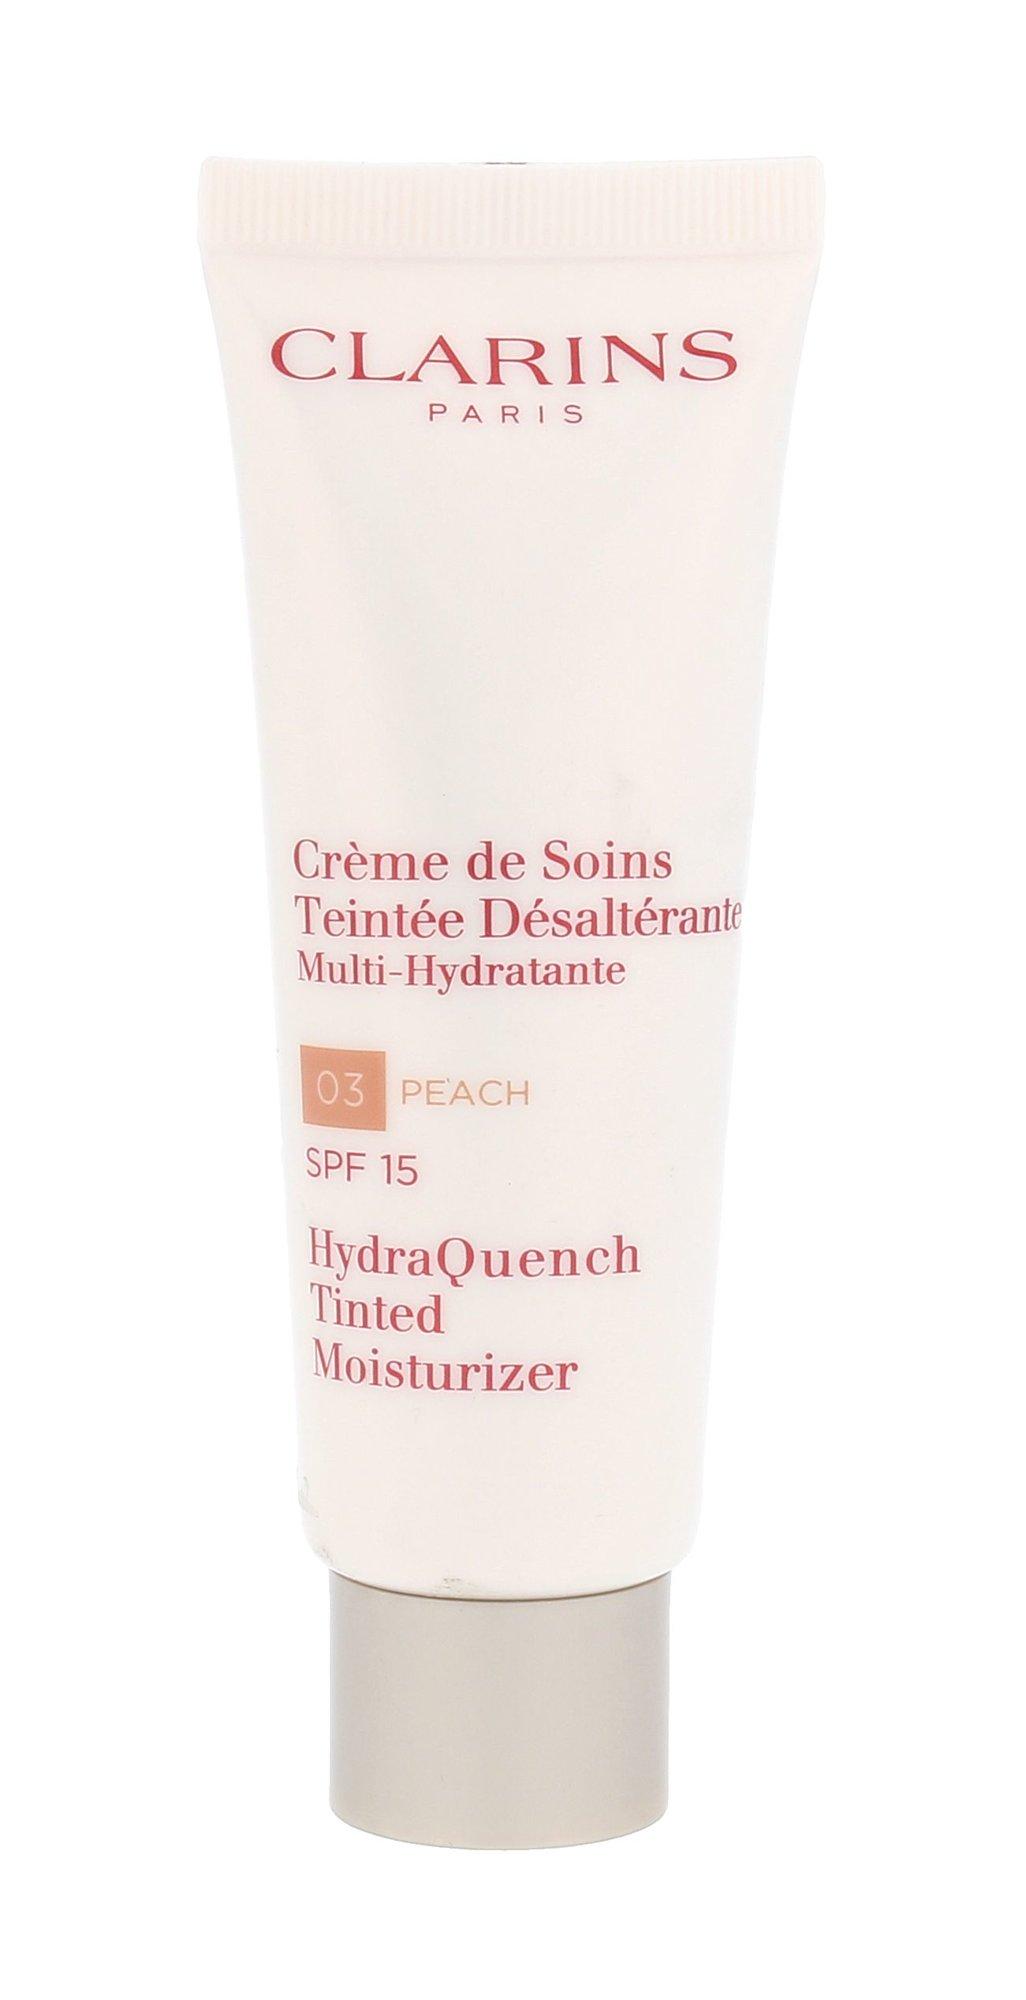 Clarins HydraQuench Cosmetic 50ml 03 Peach